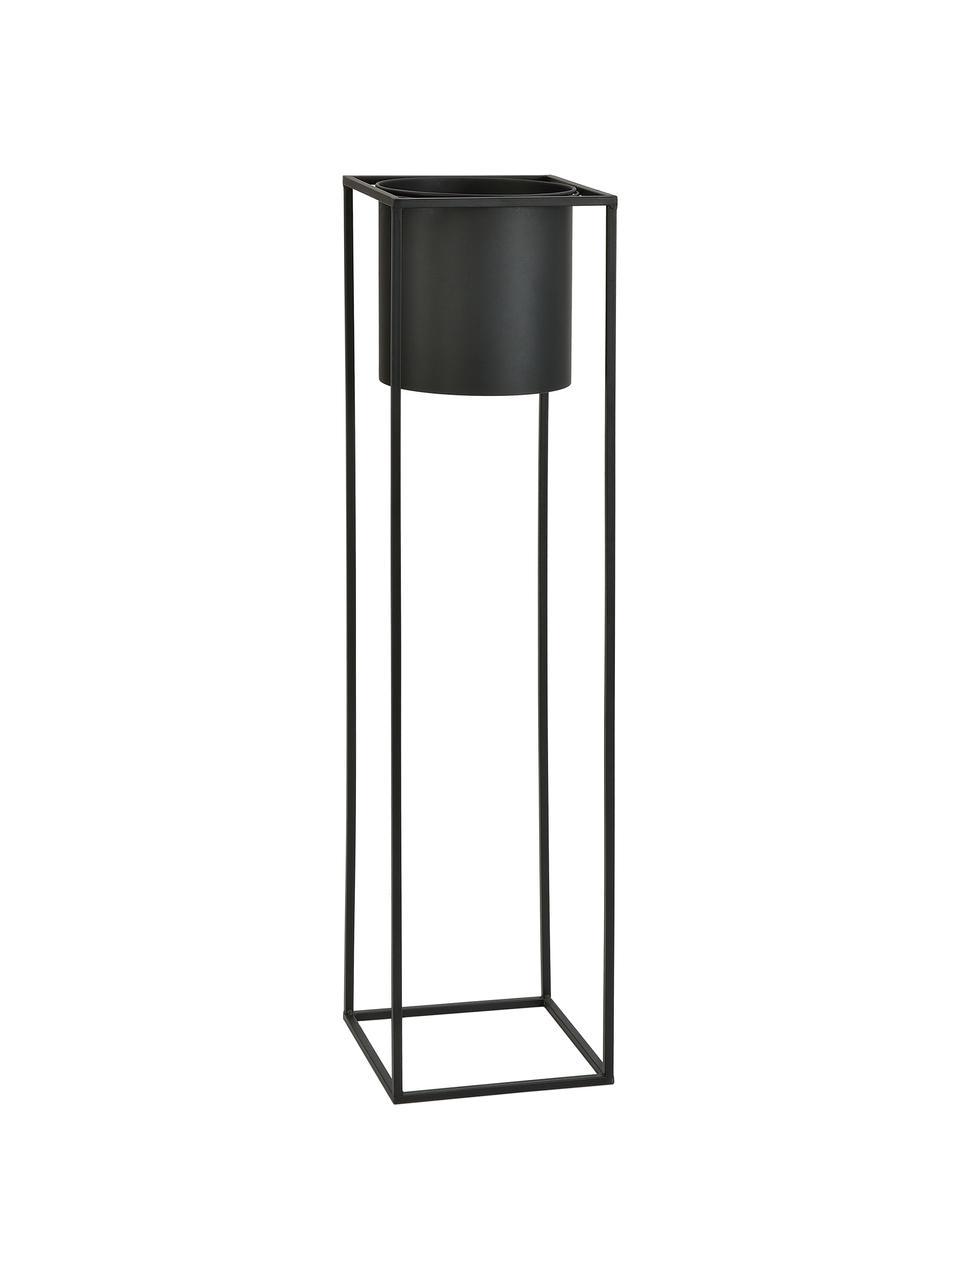 Portavaso alto in metallo Bragi, Metallo verniciato, Nero, Larg. 26 x Alt. 100 cm